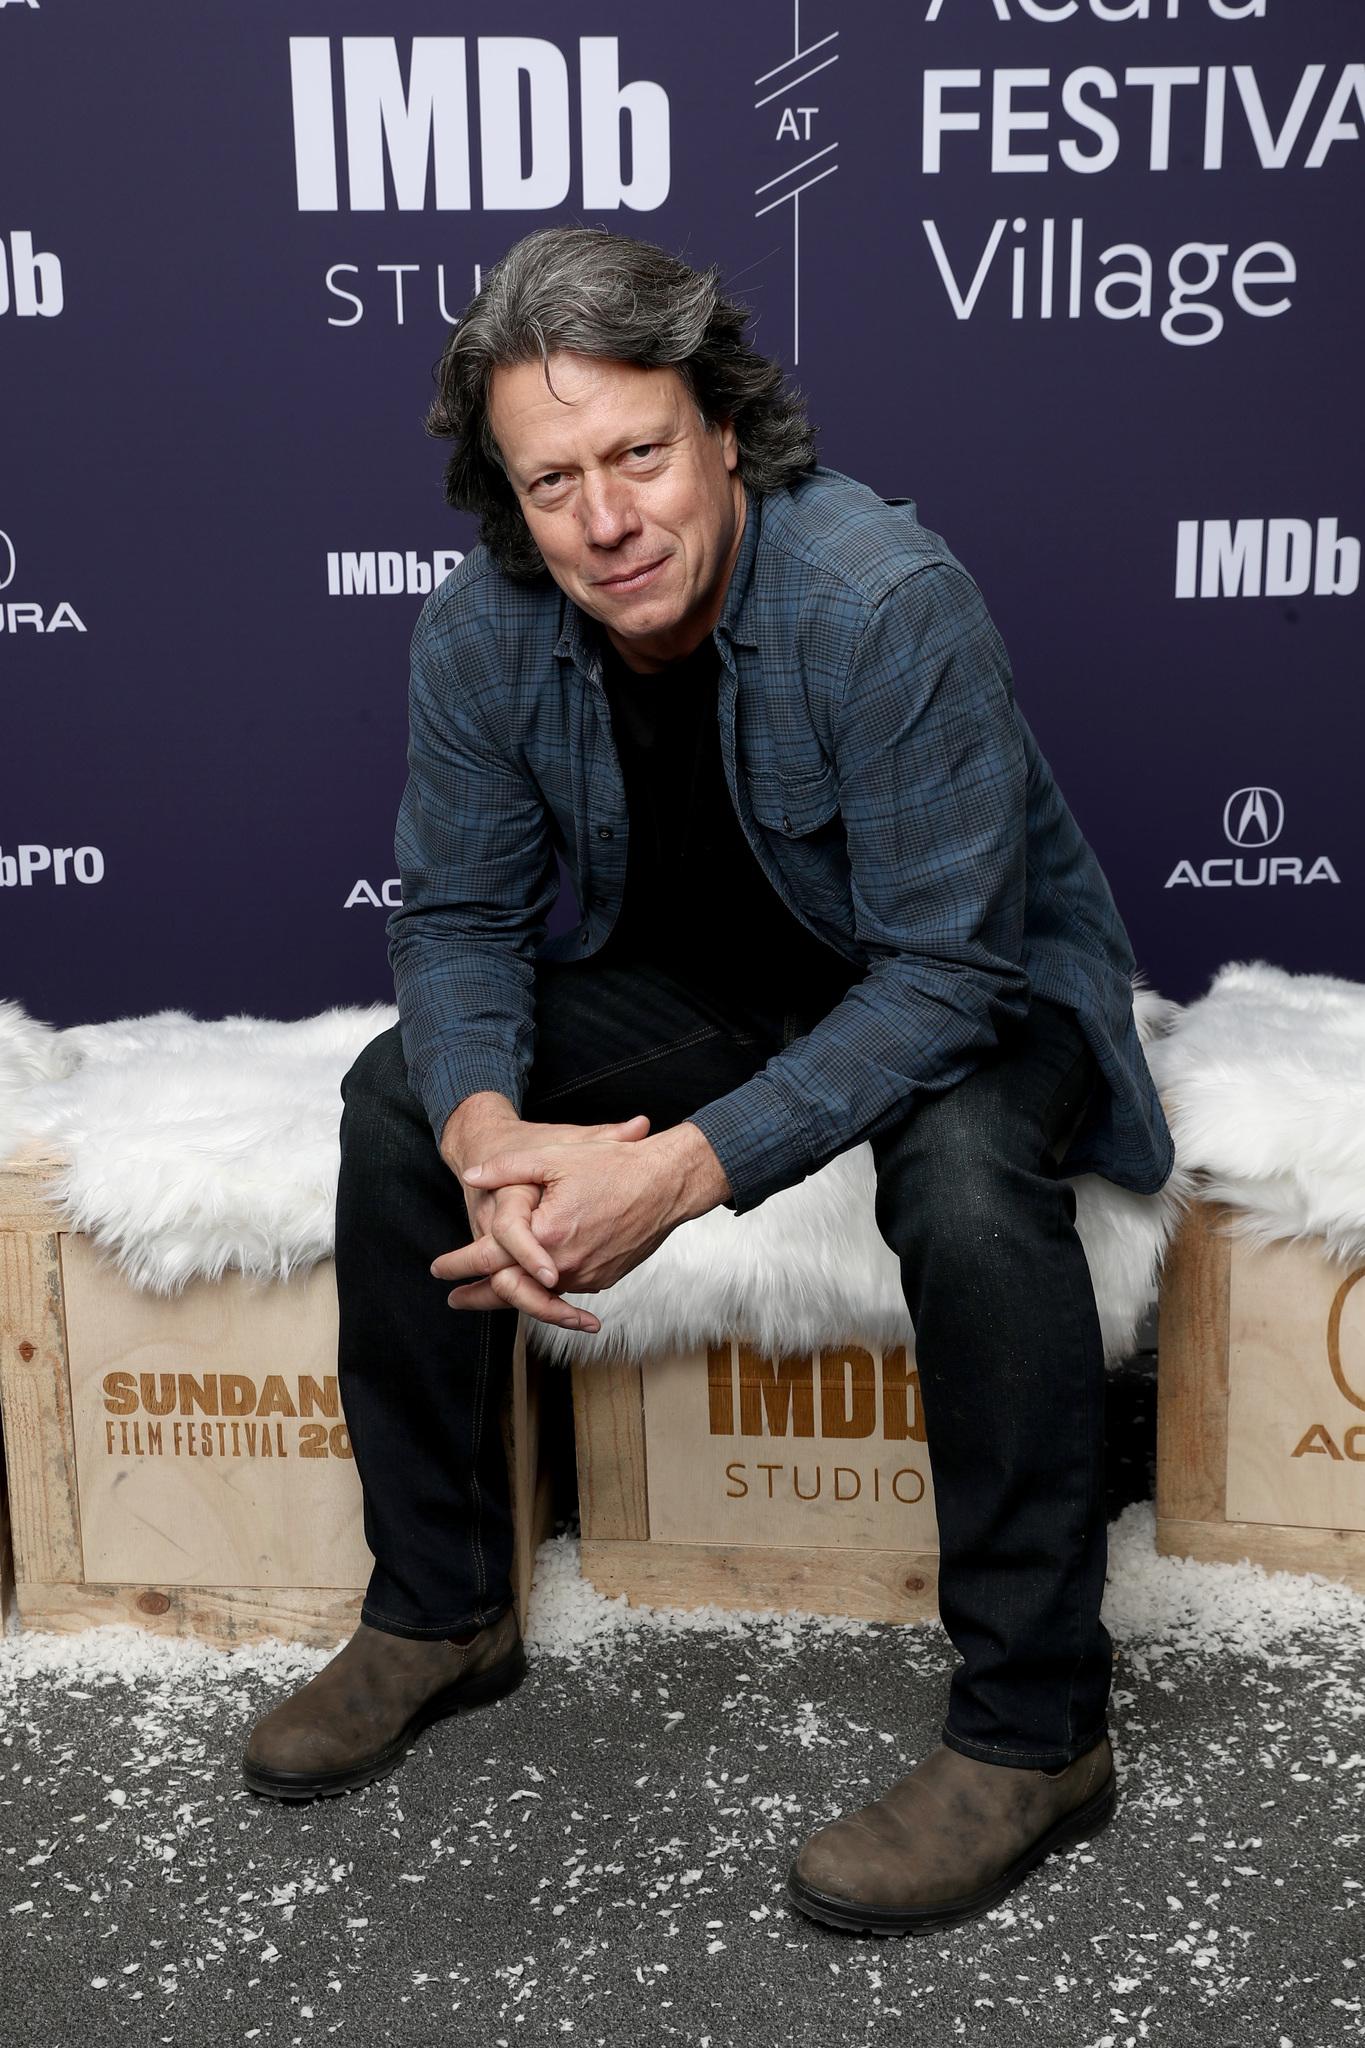 Gavin Hood at an event for The IMDb Studio at Sundance (2015)